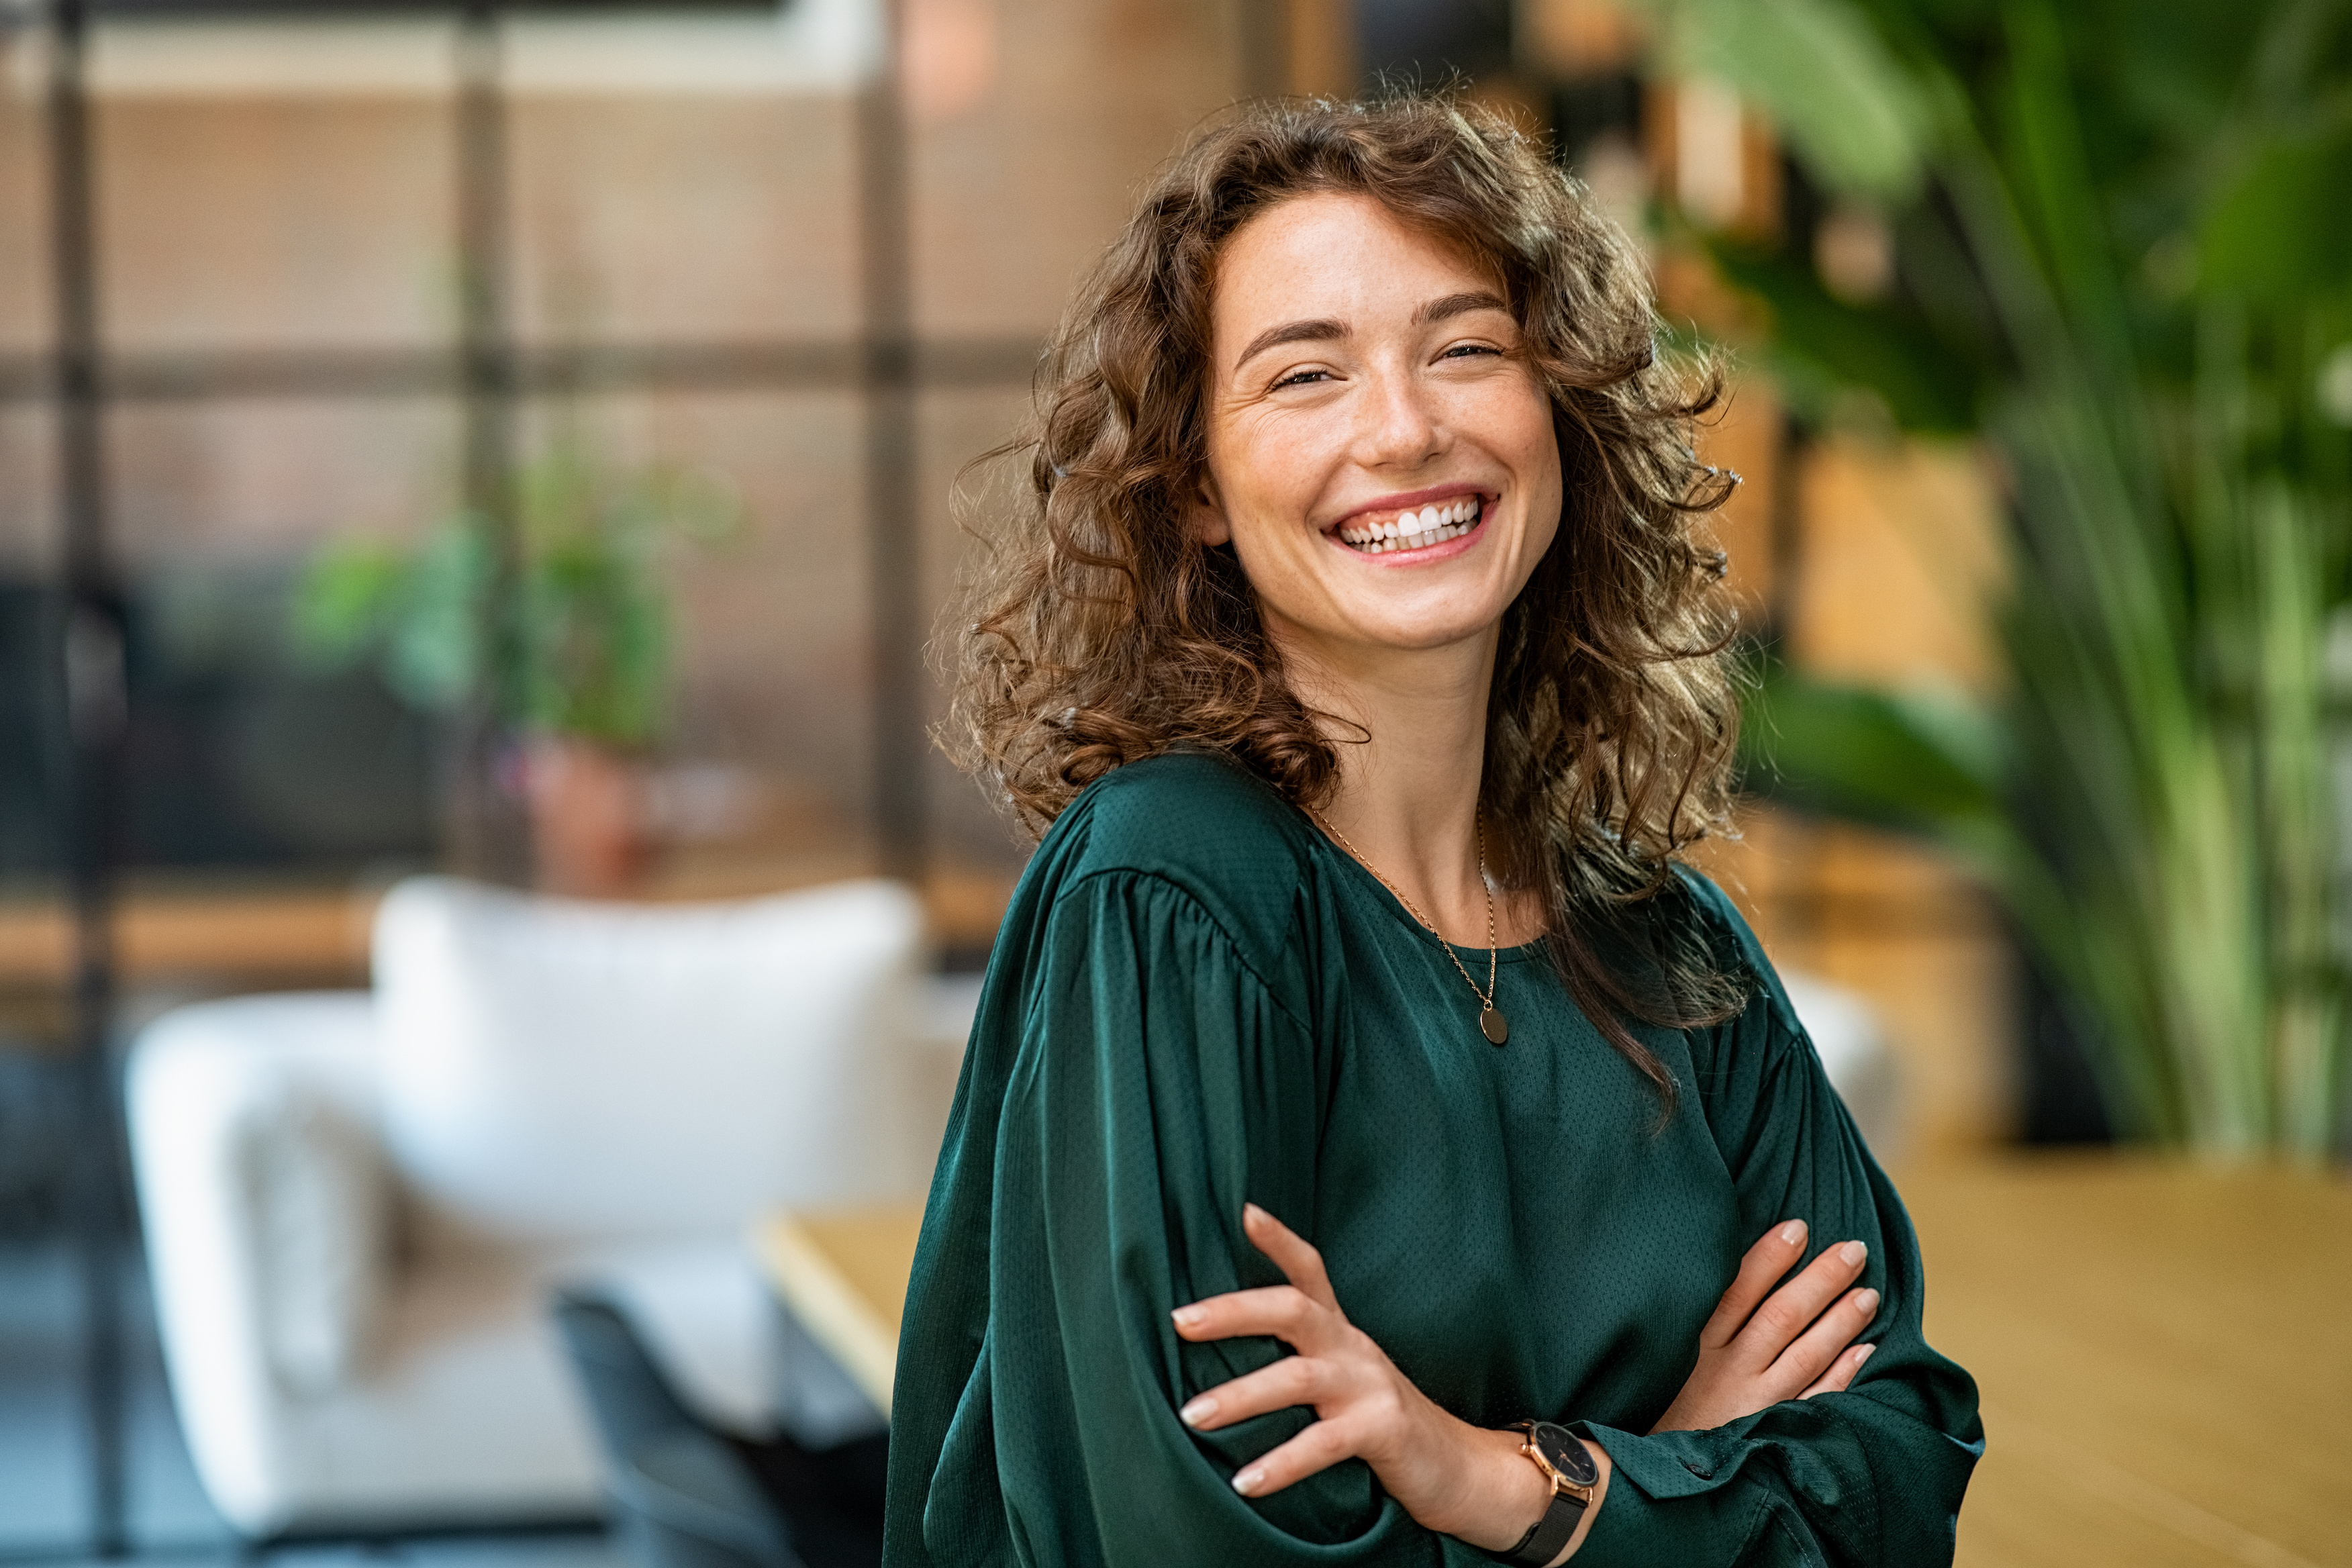 Entrepreneurship: How to Market Yourself - Style Nine to Five